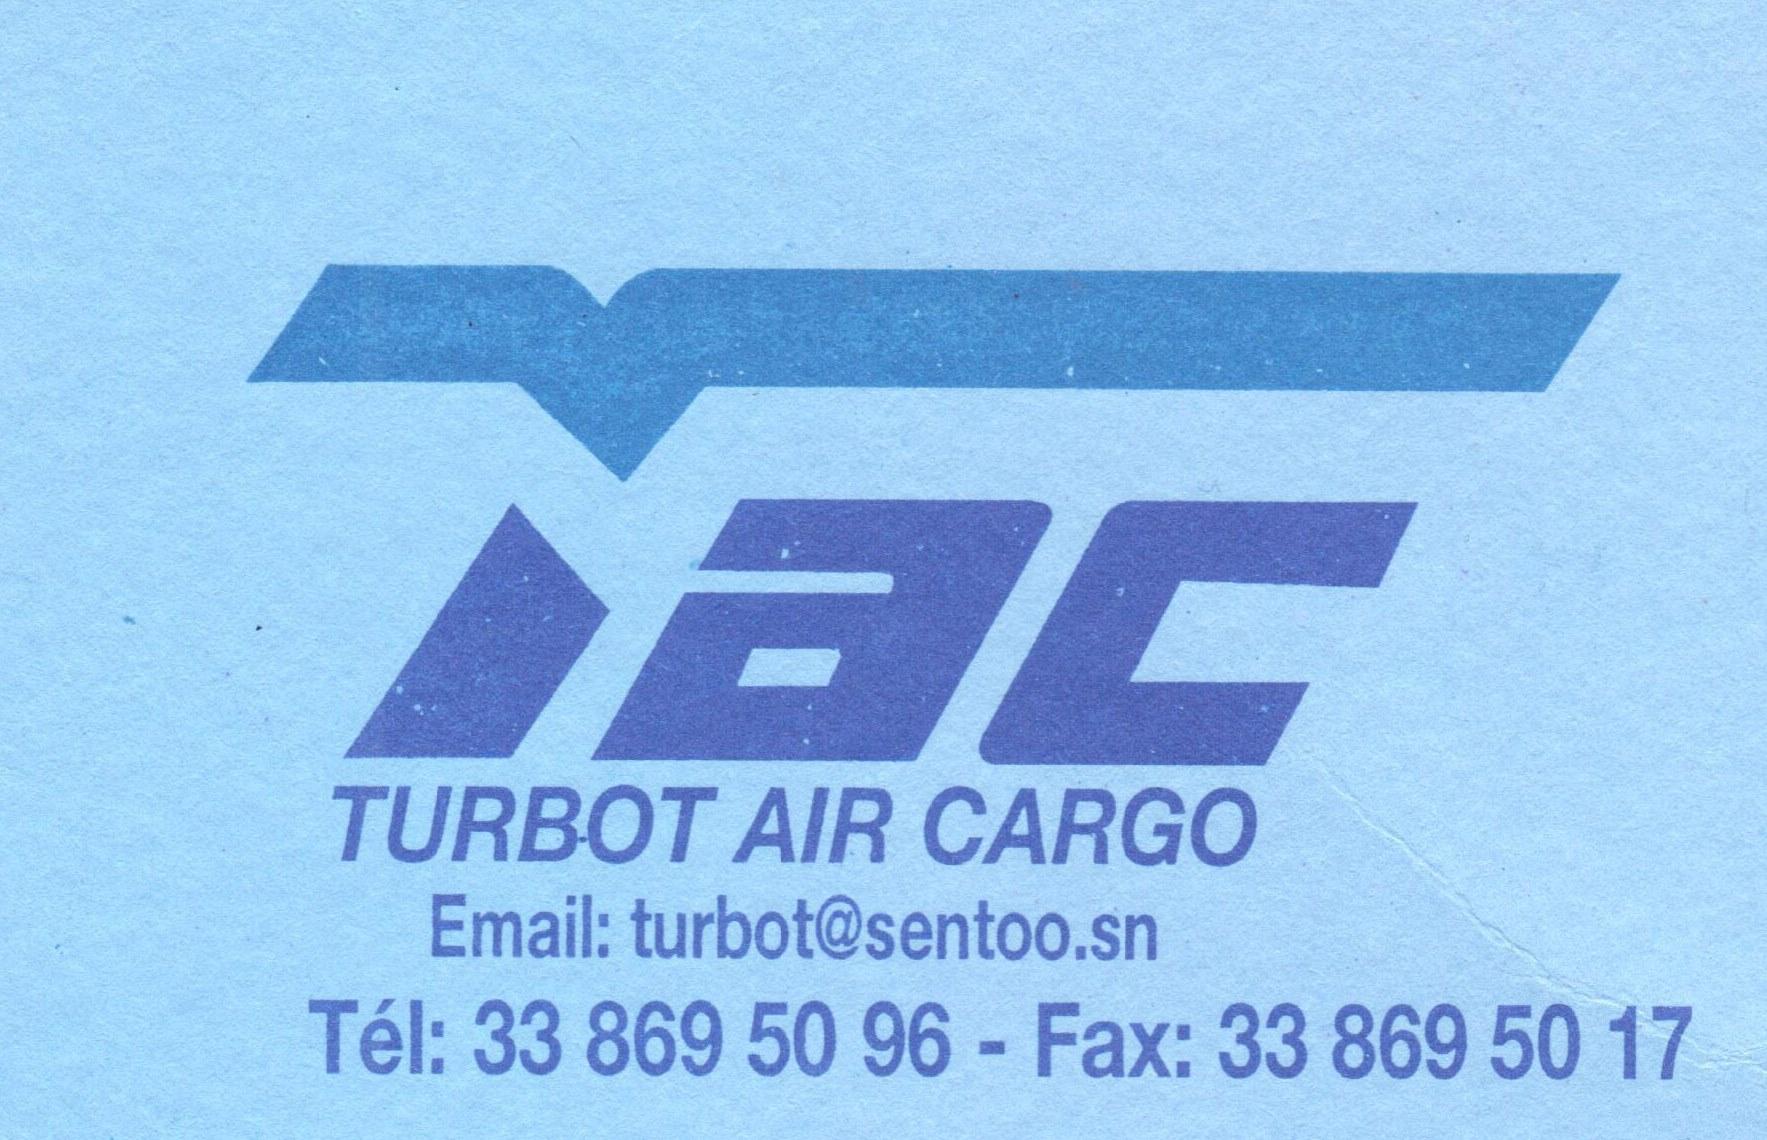 Turbot Air Cargo